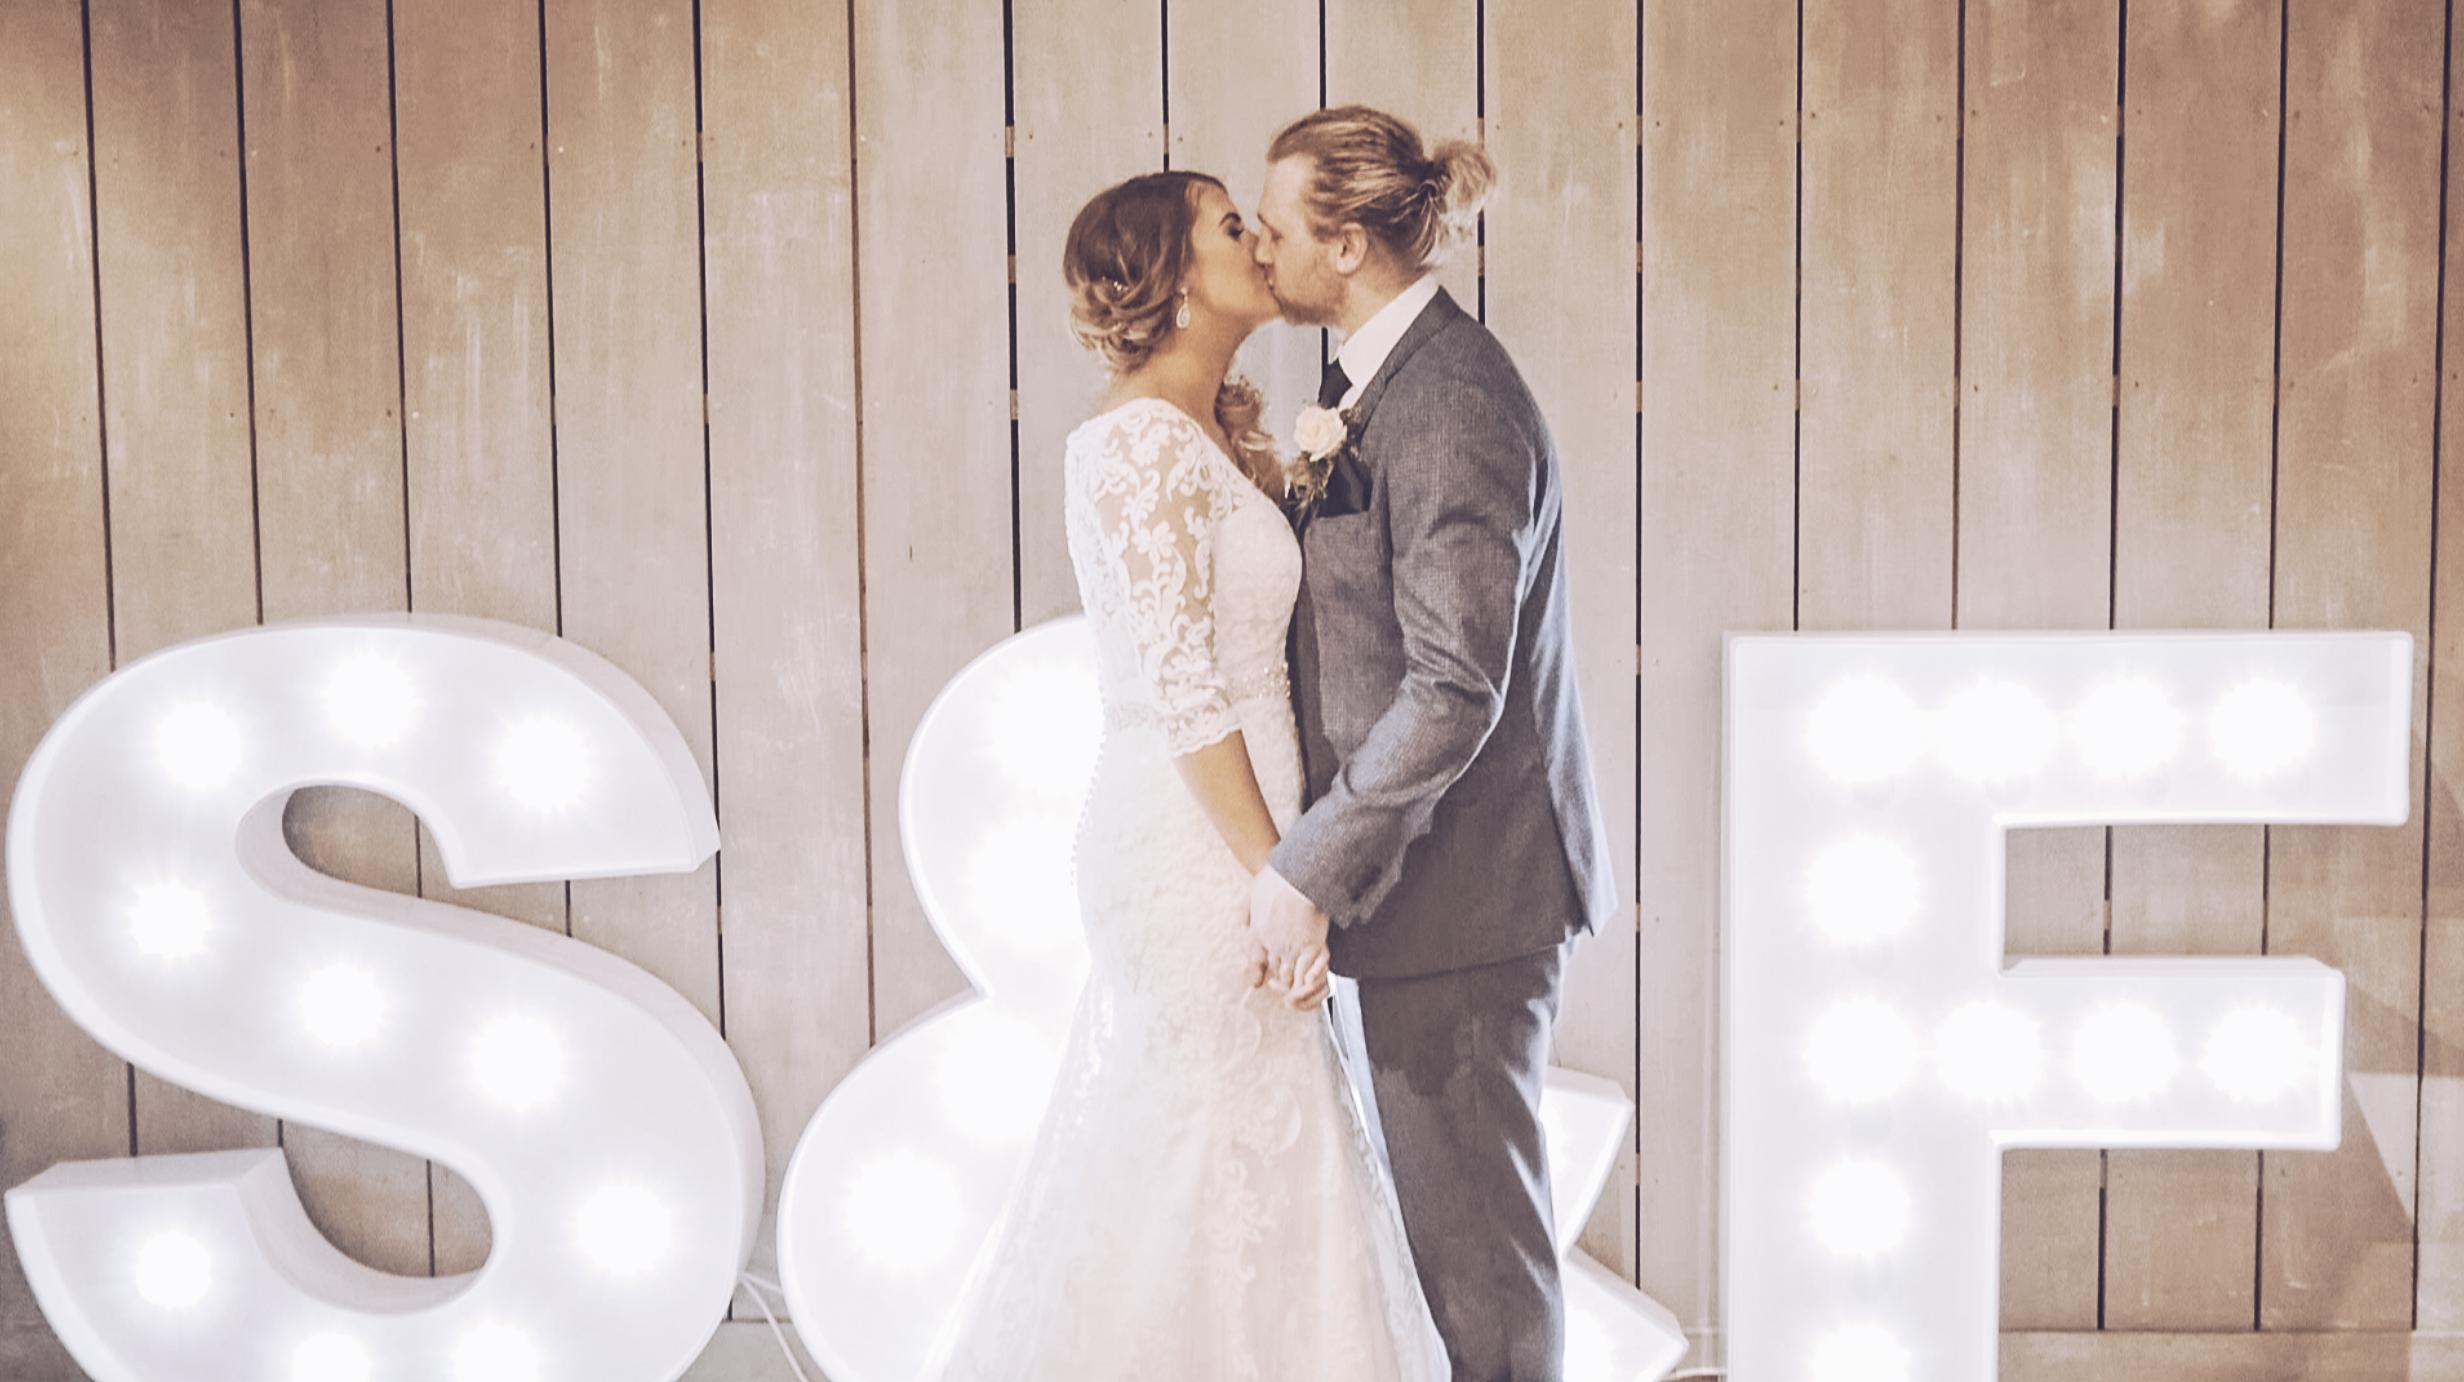 Another amazing wedding at Ballymagarvey Village – Wedding Video